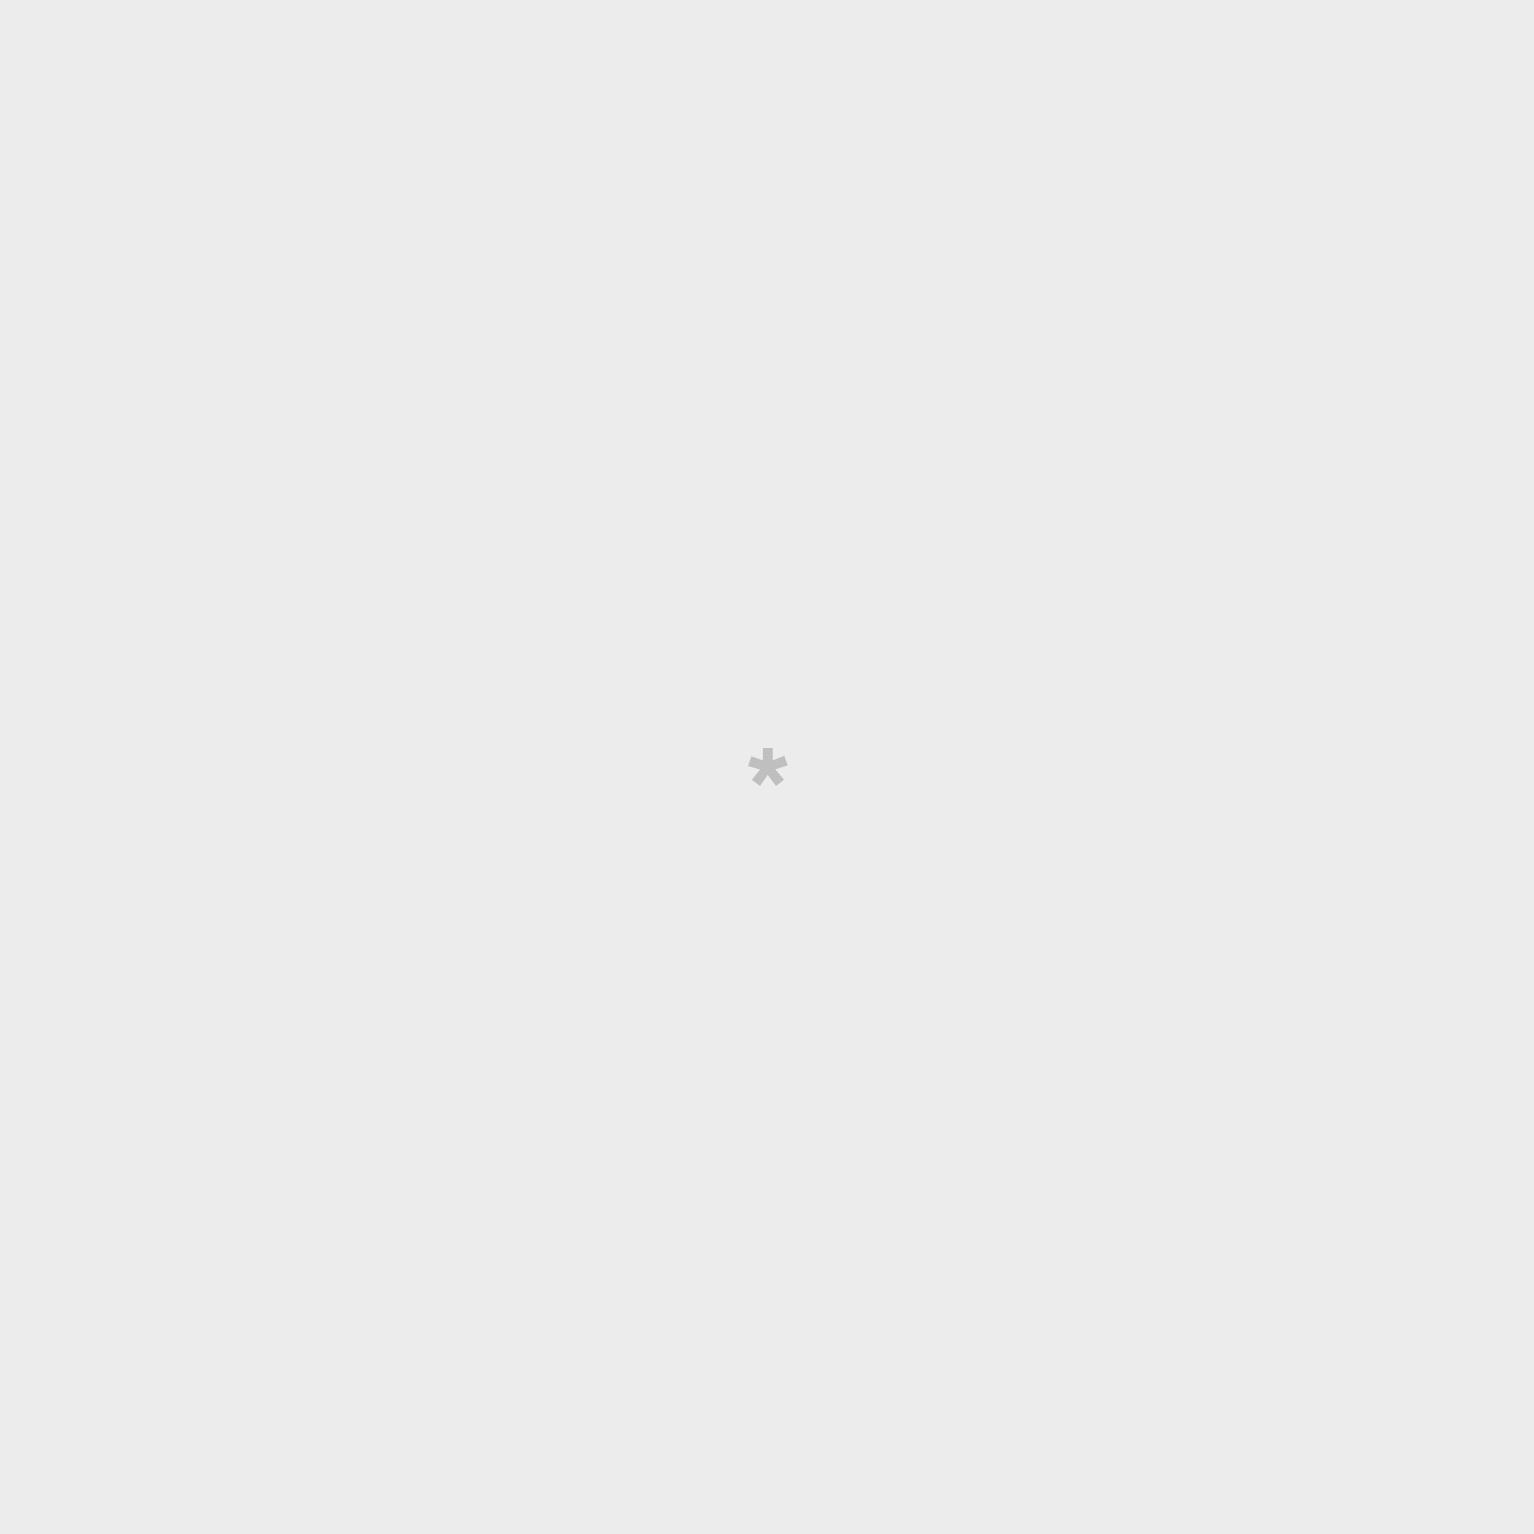 Passport holder - Hi, new favourite place!